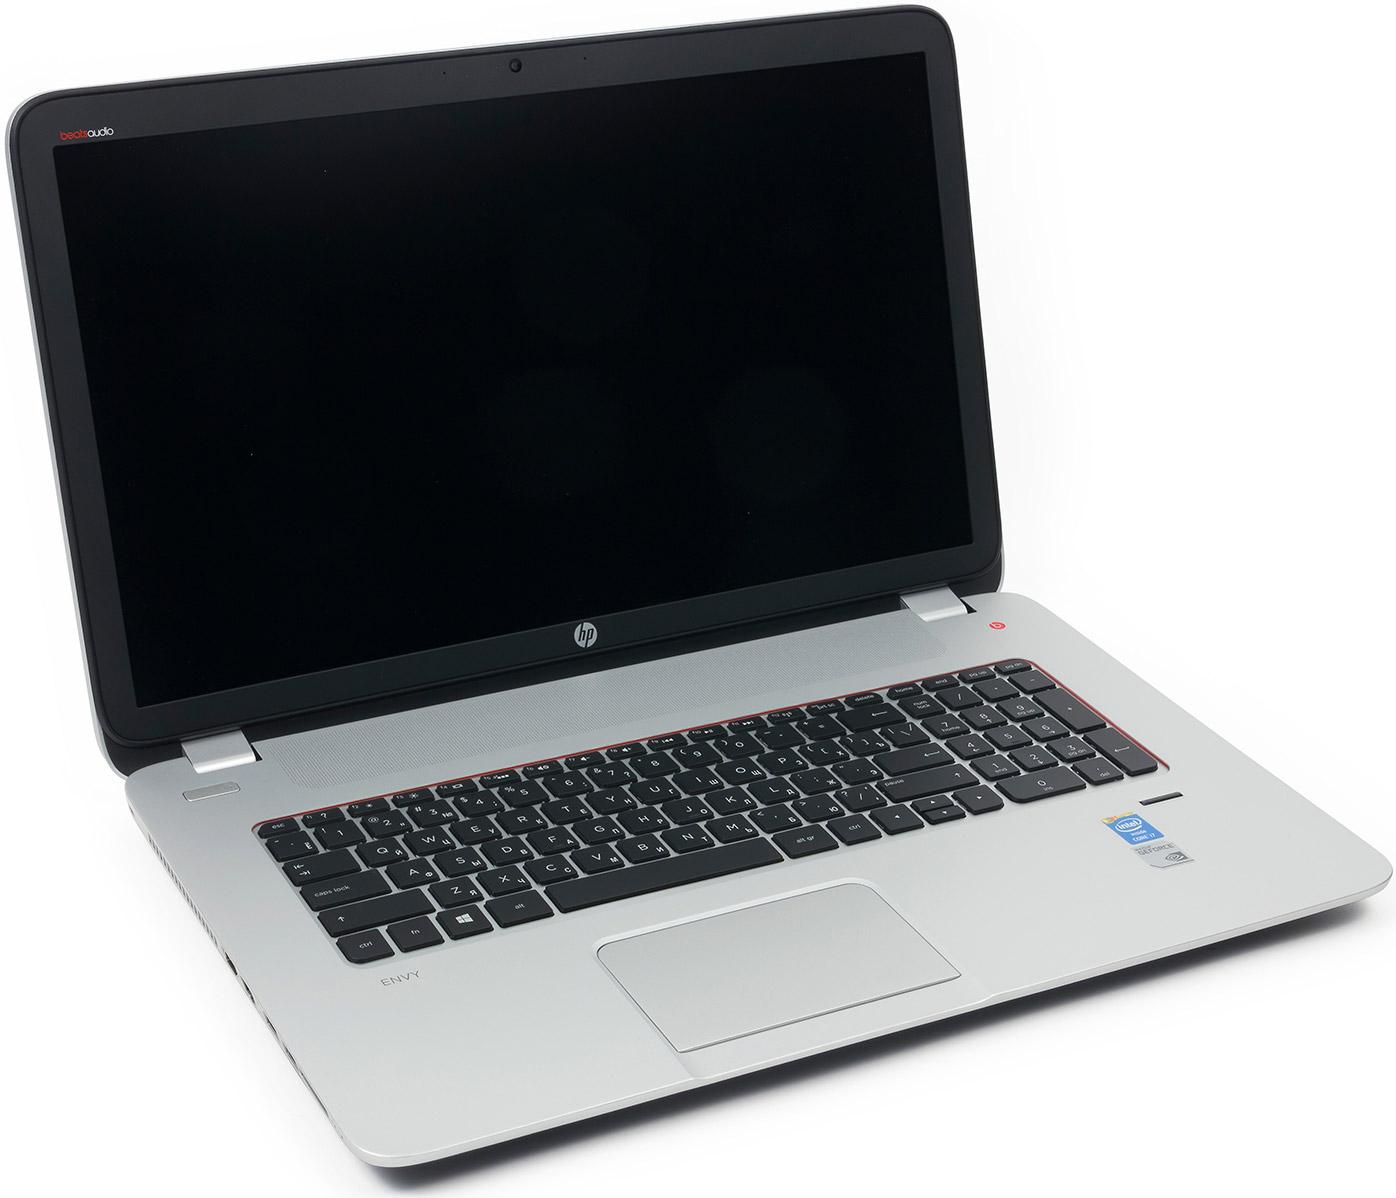 HP Envy 14-1011nr Notebook Driver Windows 7